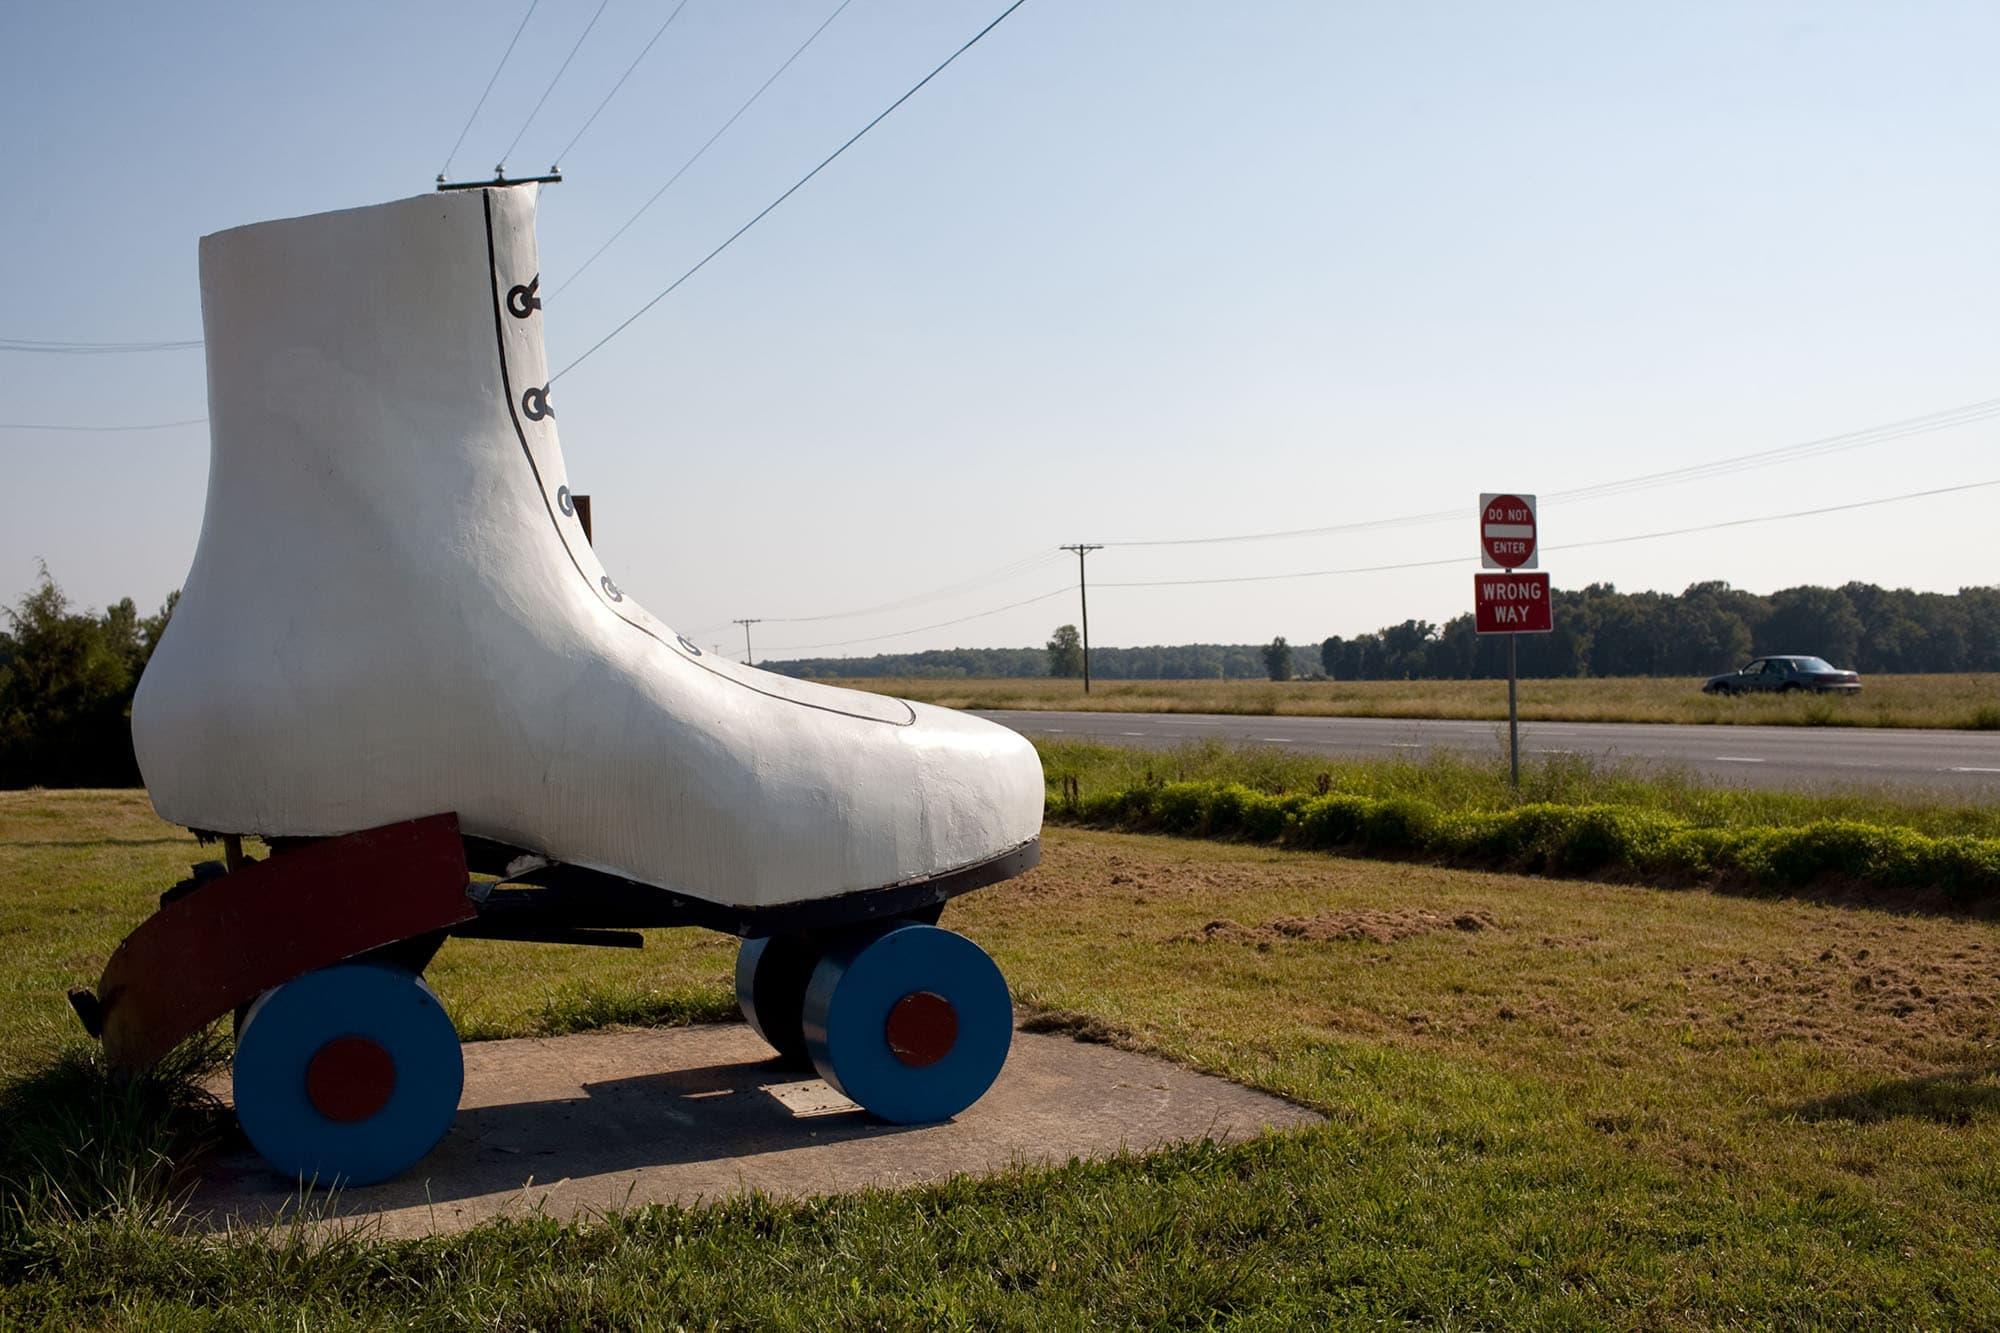 Virginia/North Carolina Road Trip - Giant Rollerskate in Virginia